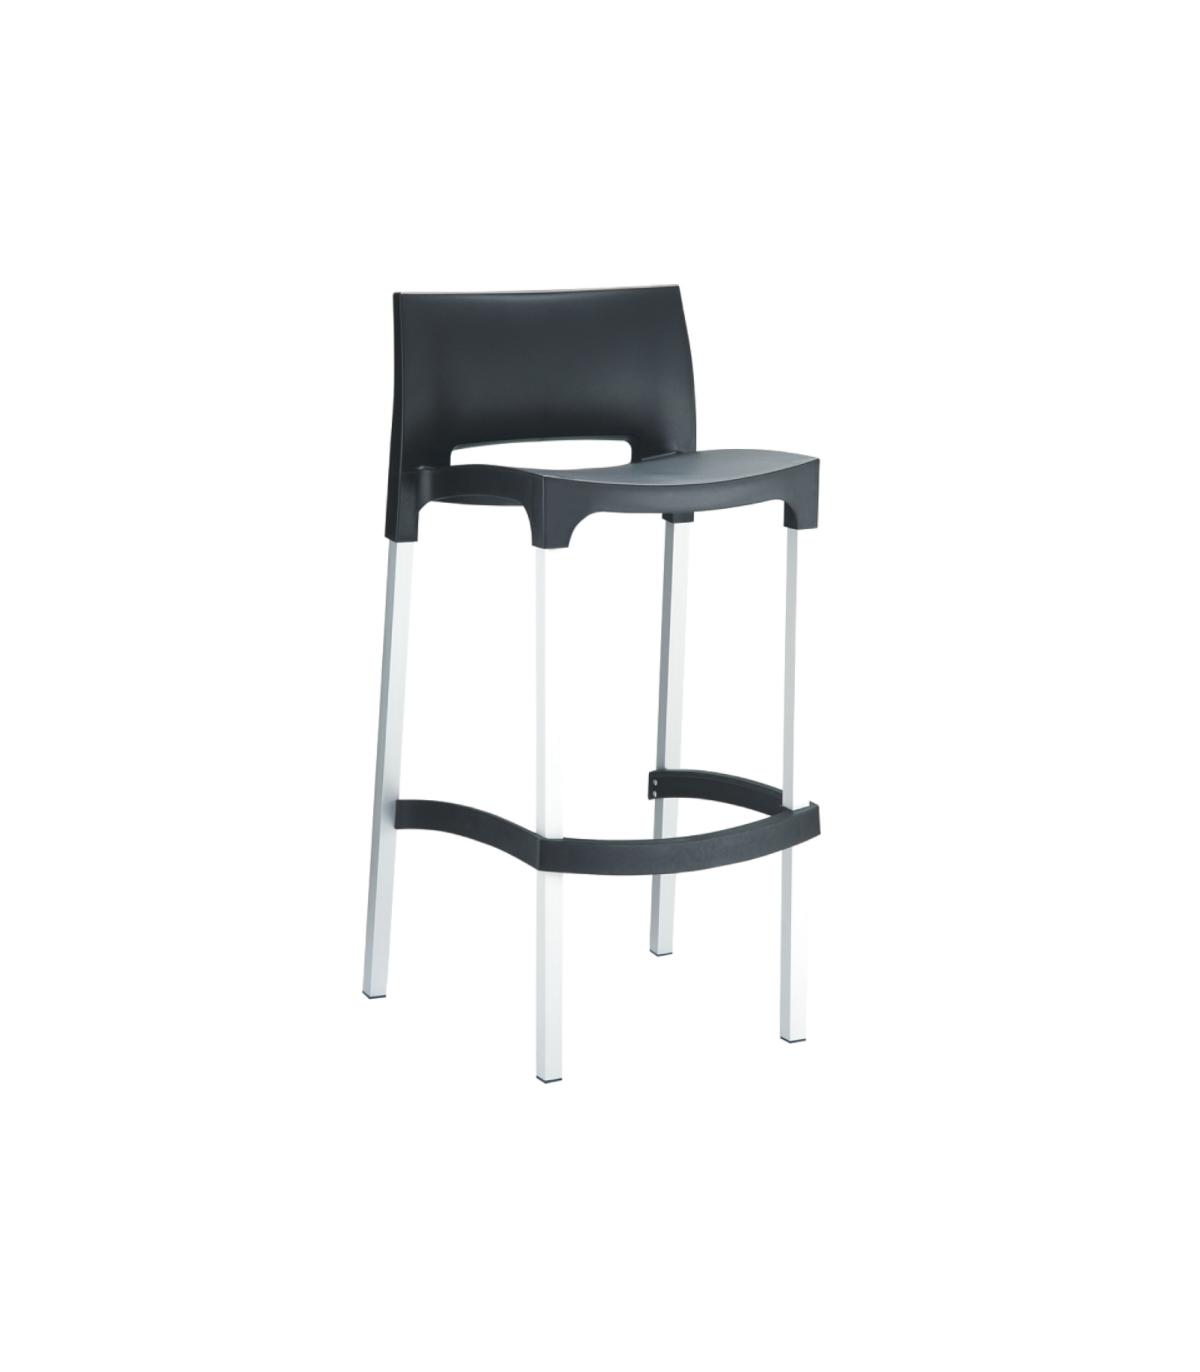 chaise haute polypropyl ne aluminium gio flex. Black Bedroom Furniture Sets. Home Design Ideas